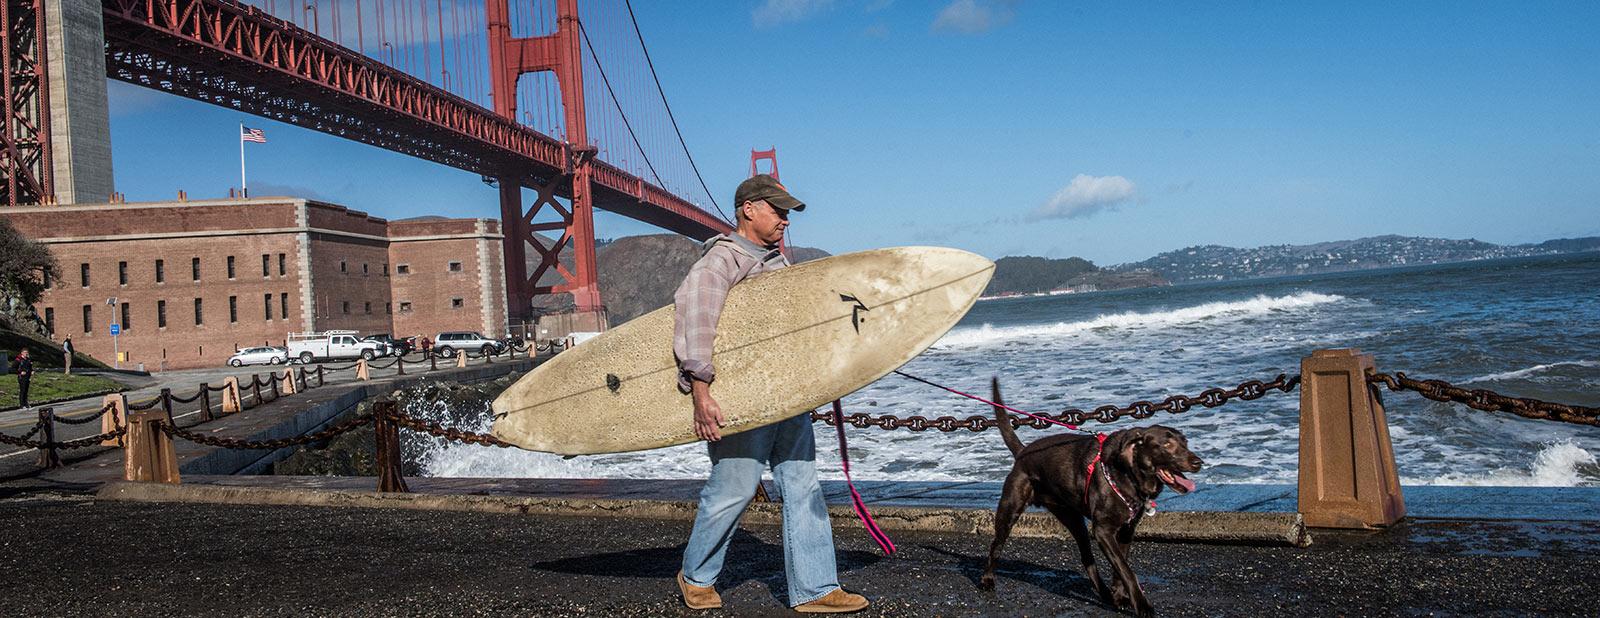 San Francisco Personal Injury Lawyers | Jones Clifford